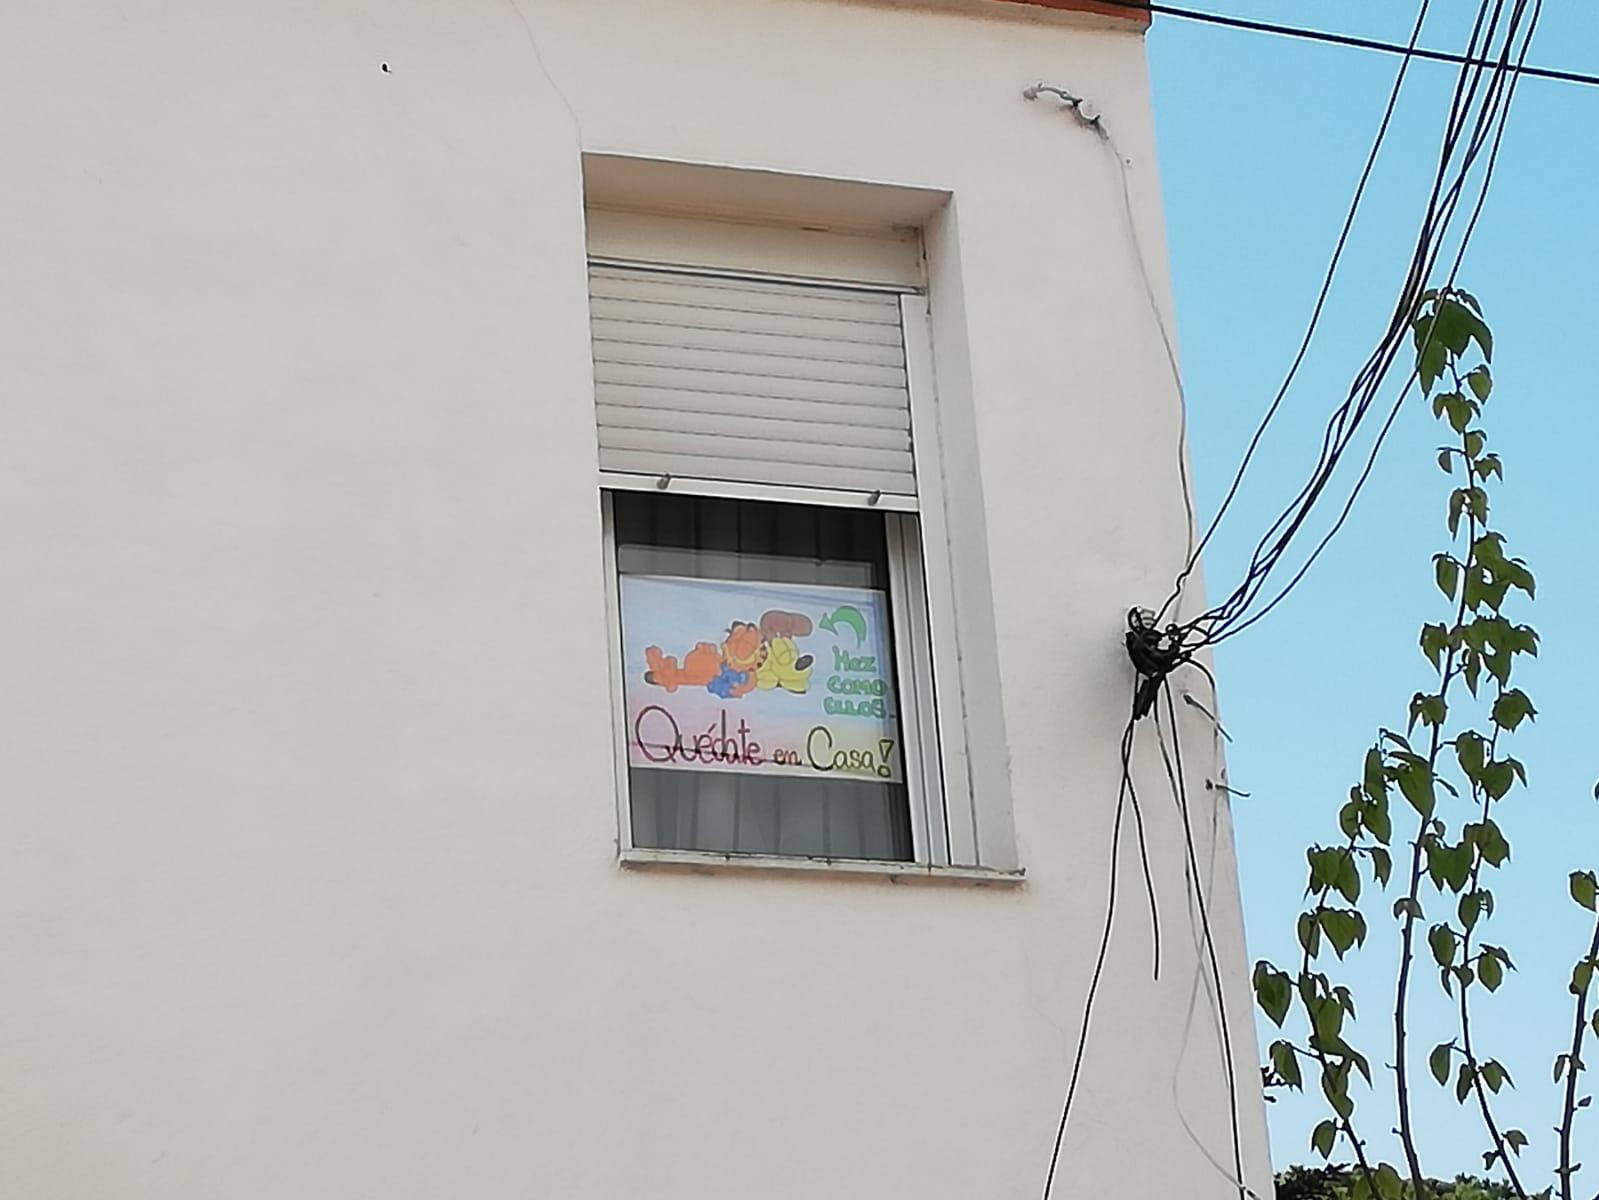 Cartell a la finestra